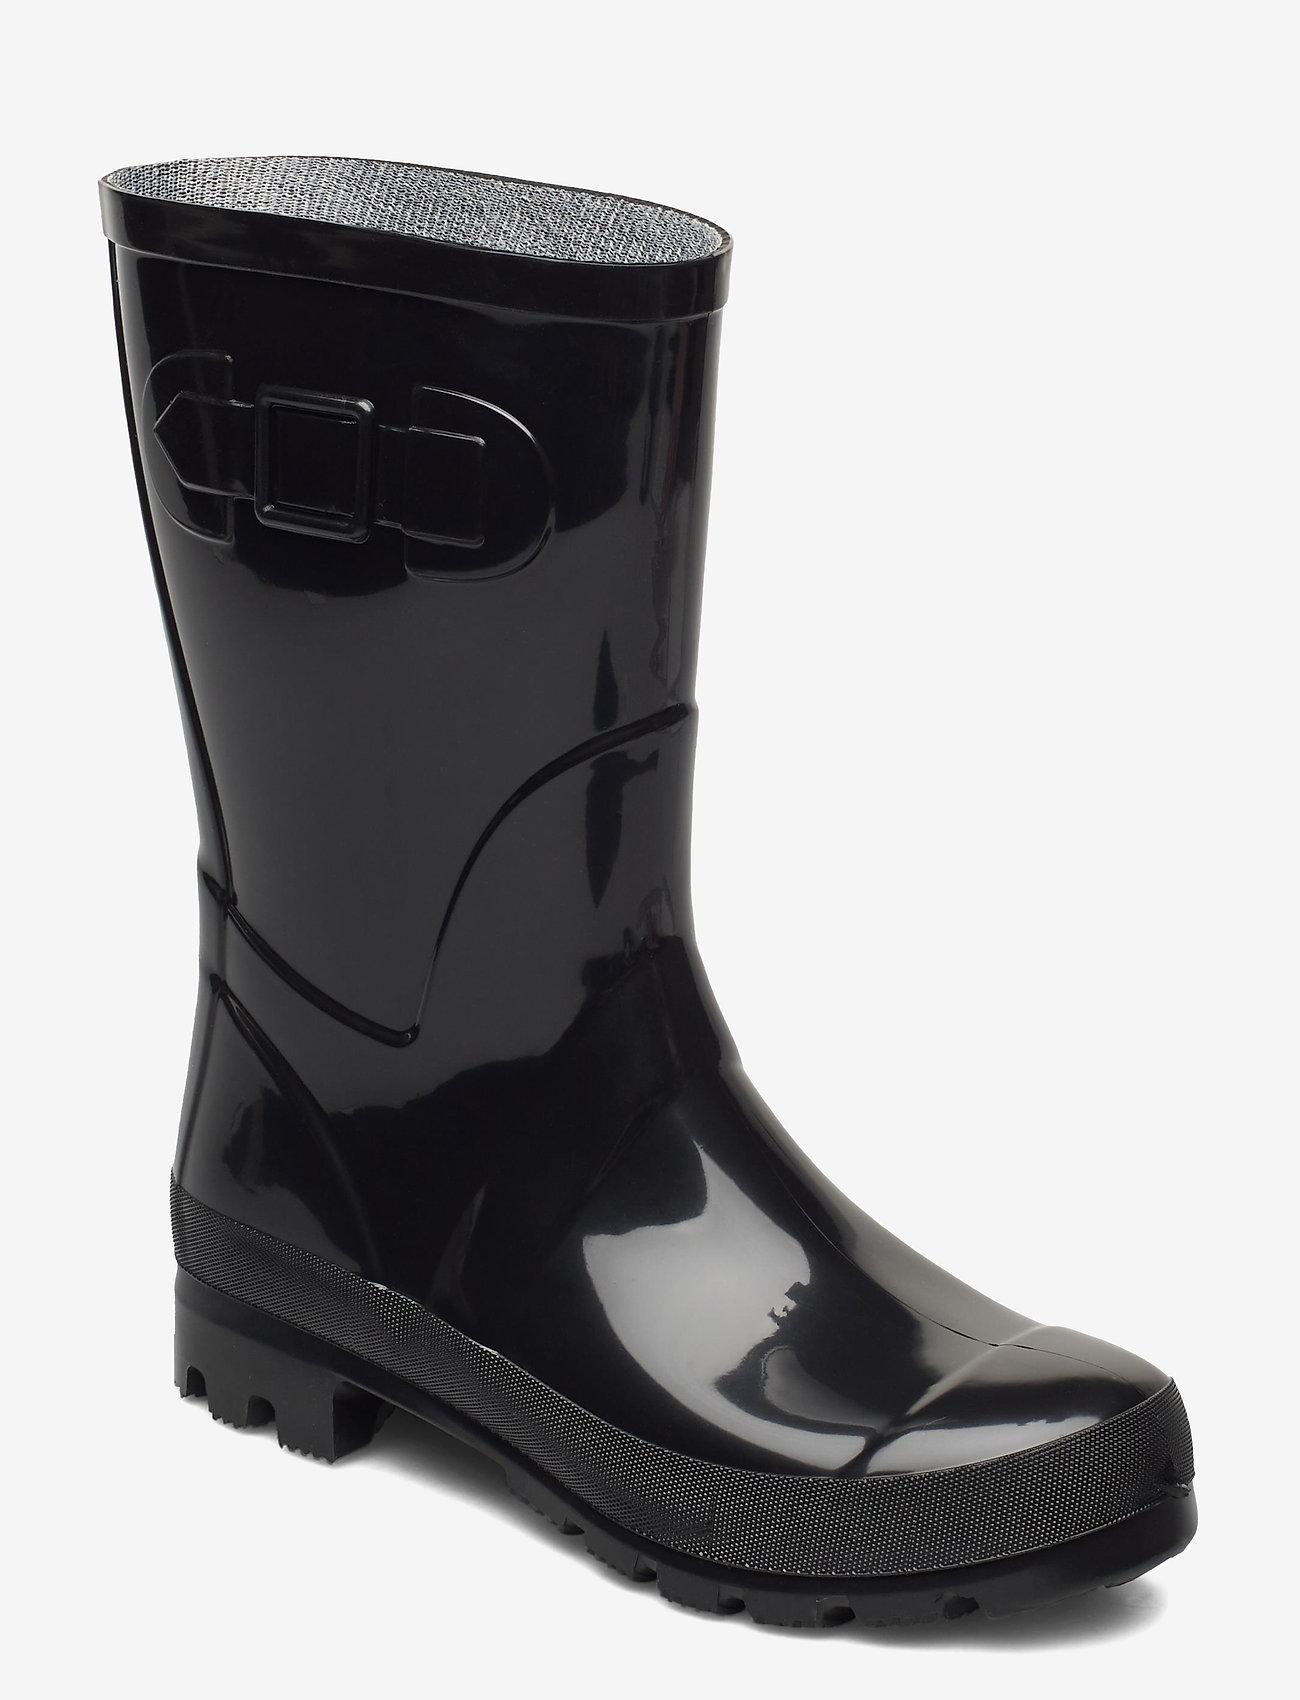 Paliutis - COMFORT rainboots - kalosze - black - 0